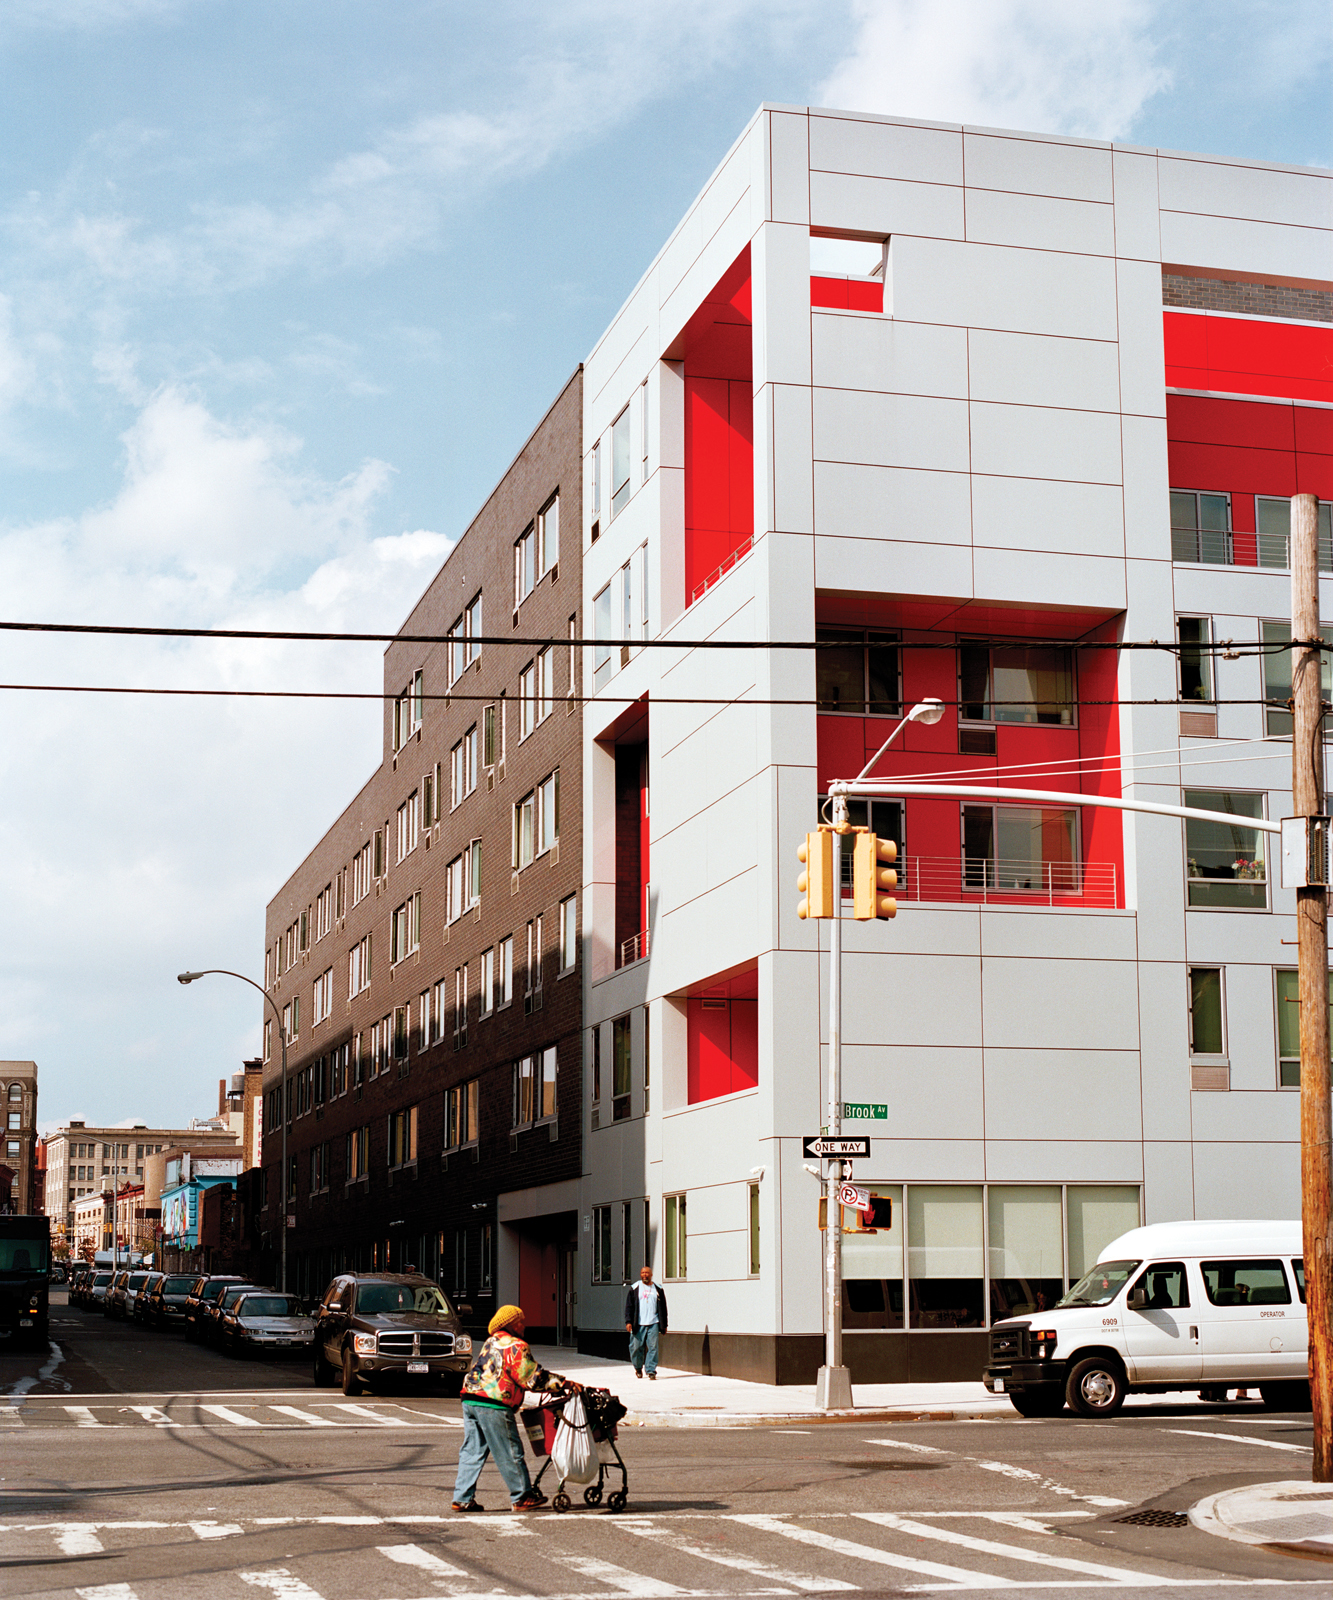 Housing development in South Bronx, New York